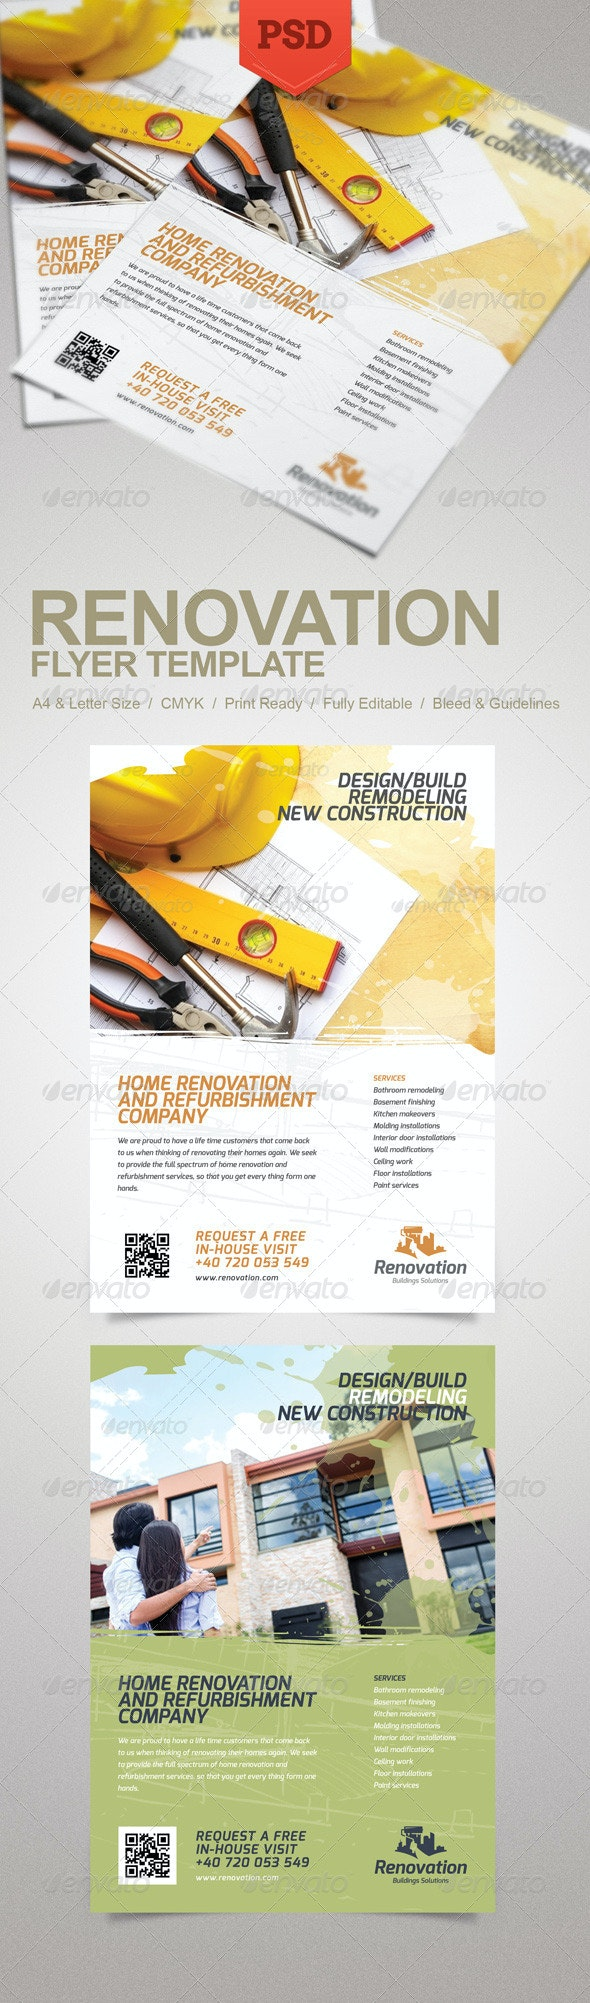 Renovation Flyer - Corporate Flyers